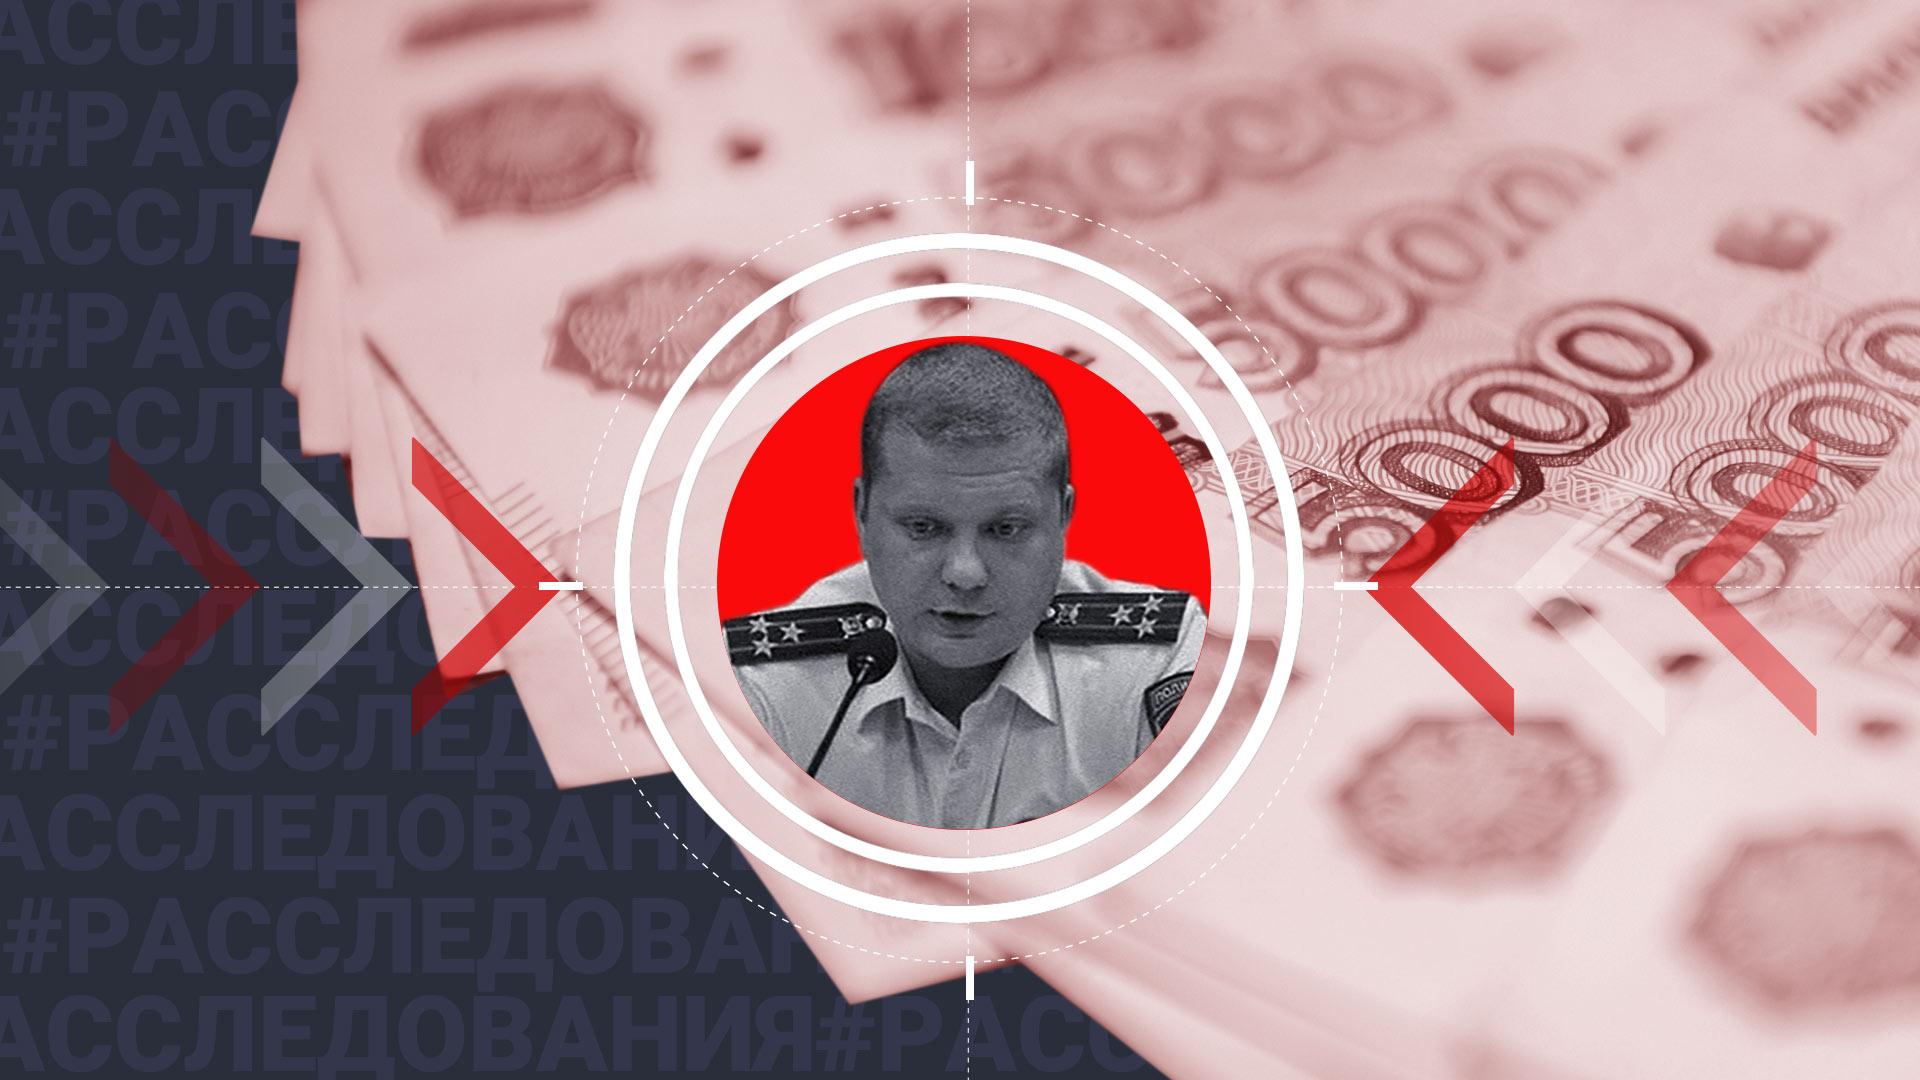 "<p>Коллаж © LIFE. Фото ©Shutterstock ©<a href=""https://sibkray.ru/news/1/939153/"" target=""_blank"" rel=""noopener noreferrer"">sibkray.ru</a></p>"